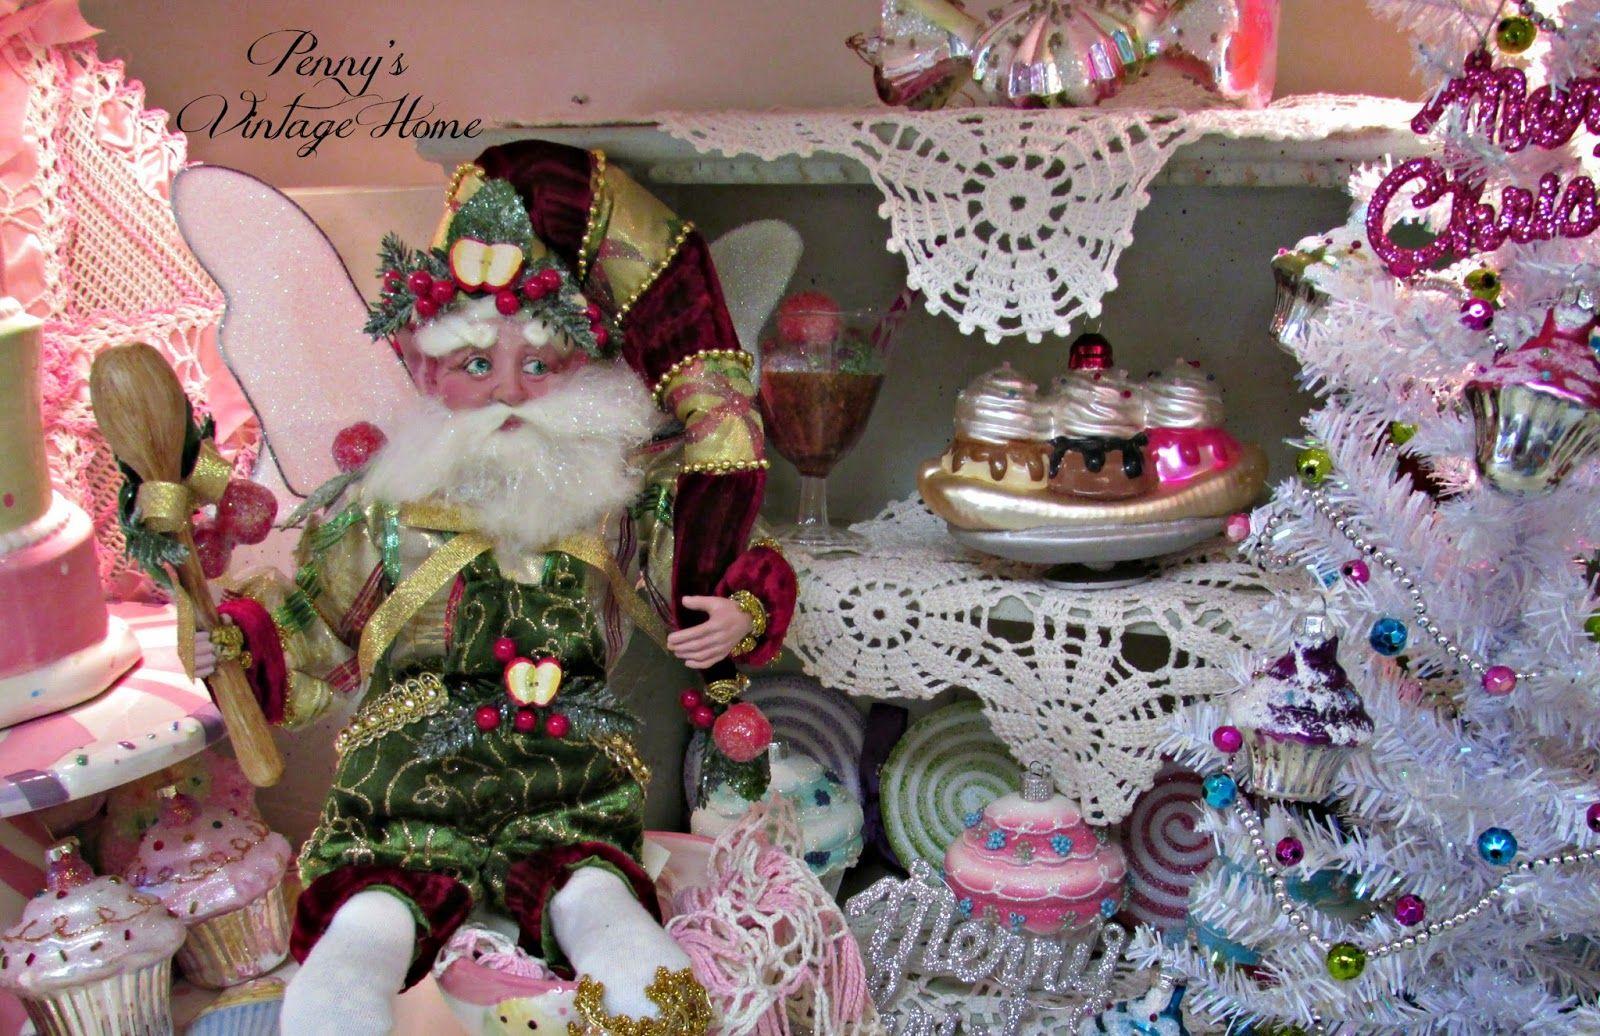 Pennyus vintage home christmas kitchen christmas ideas